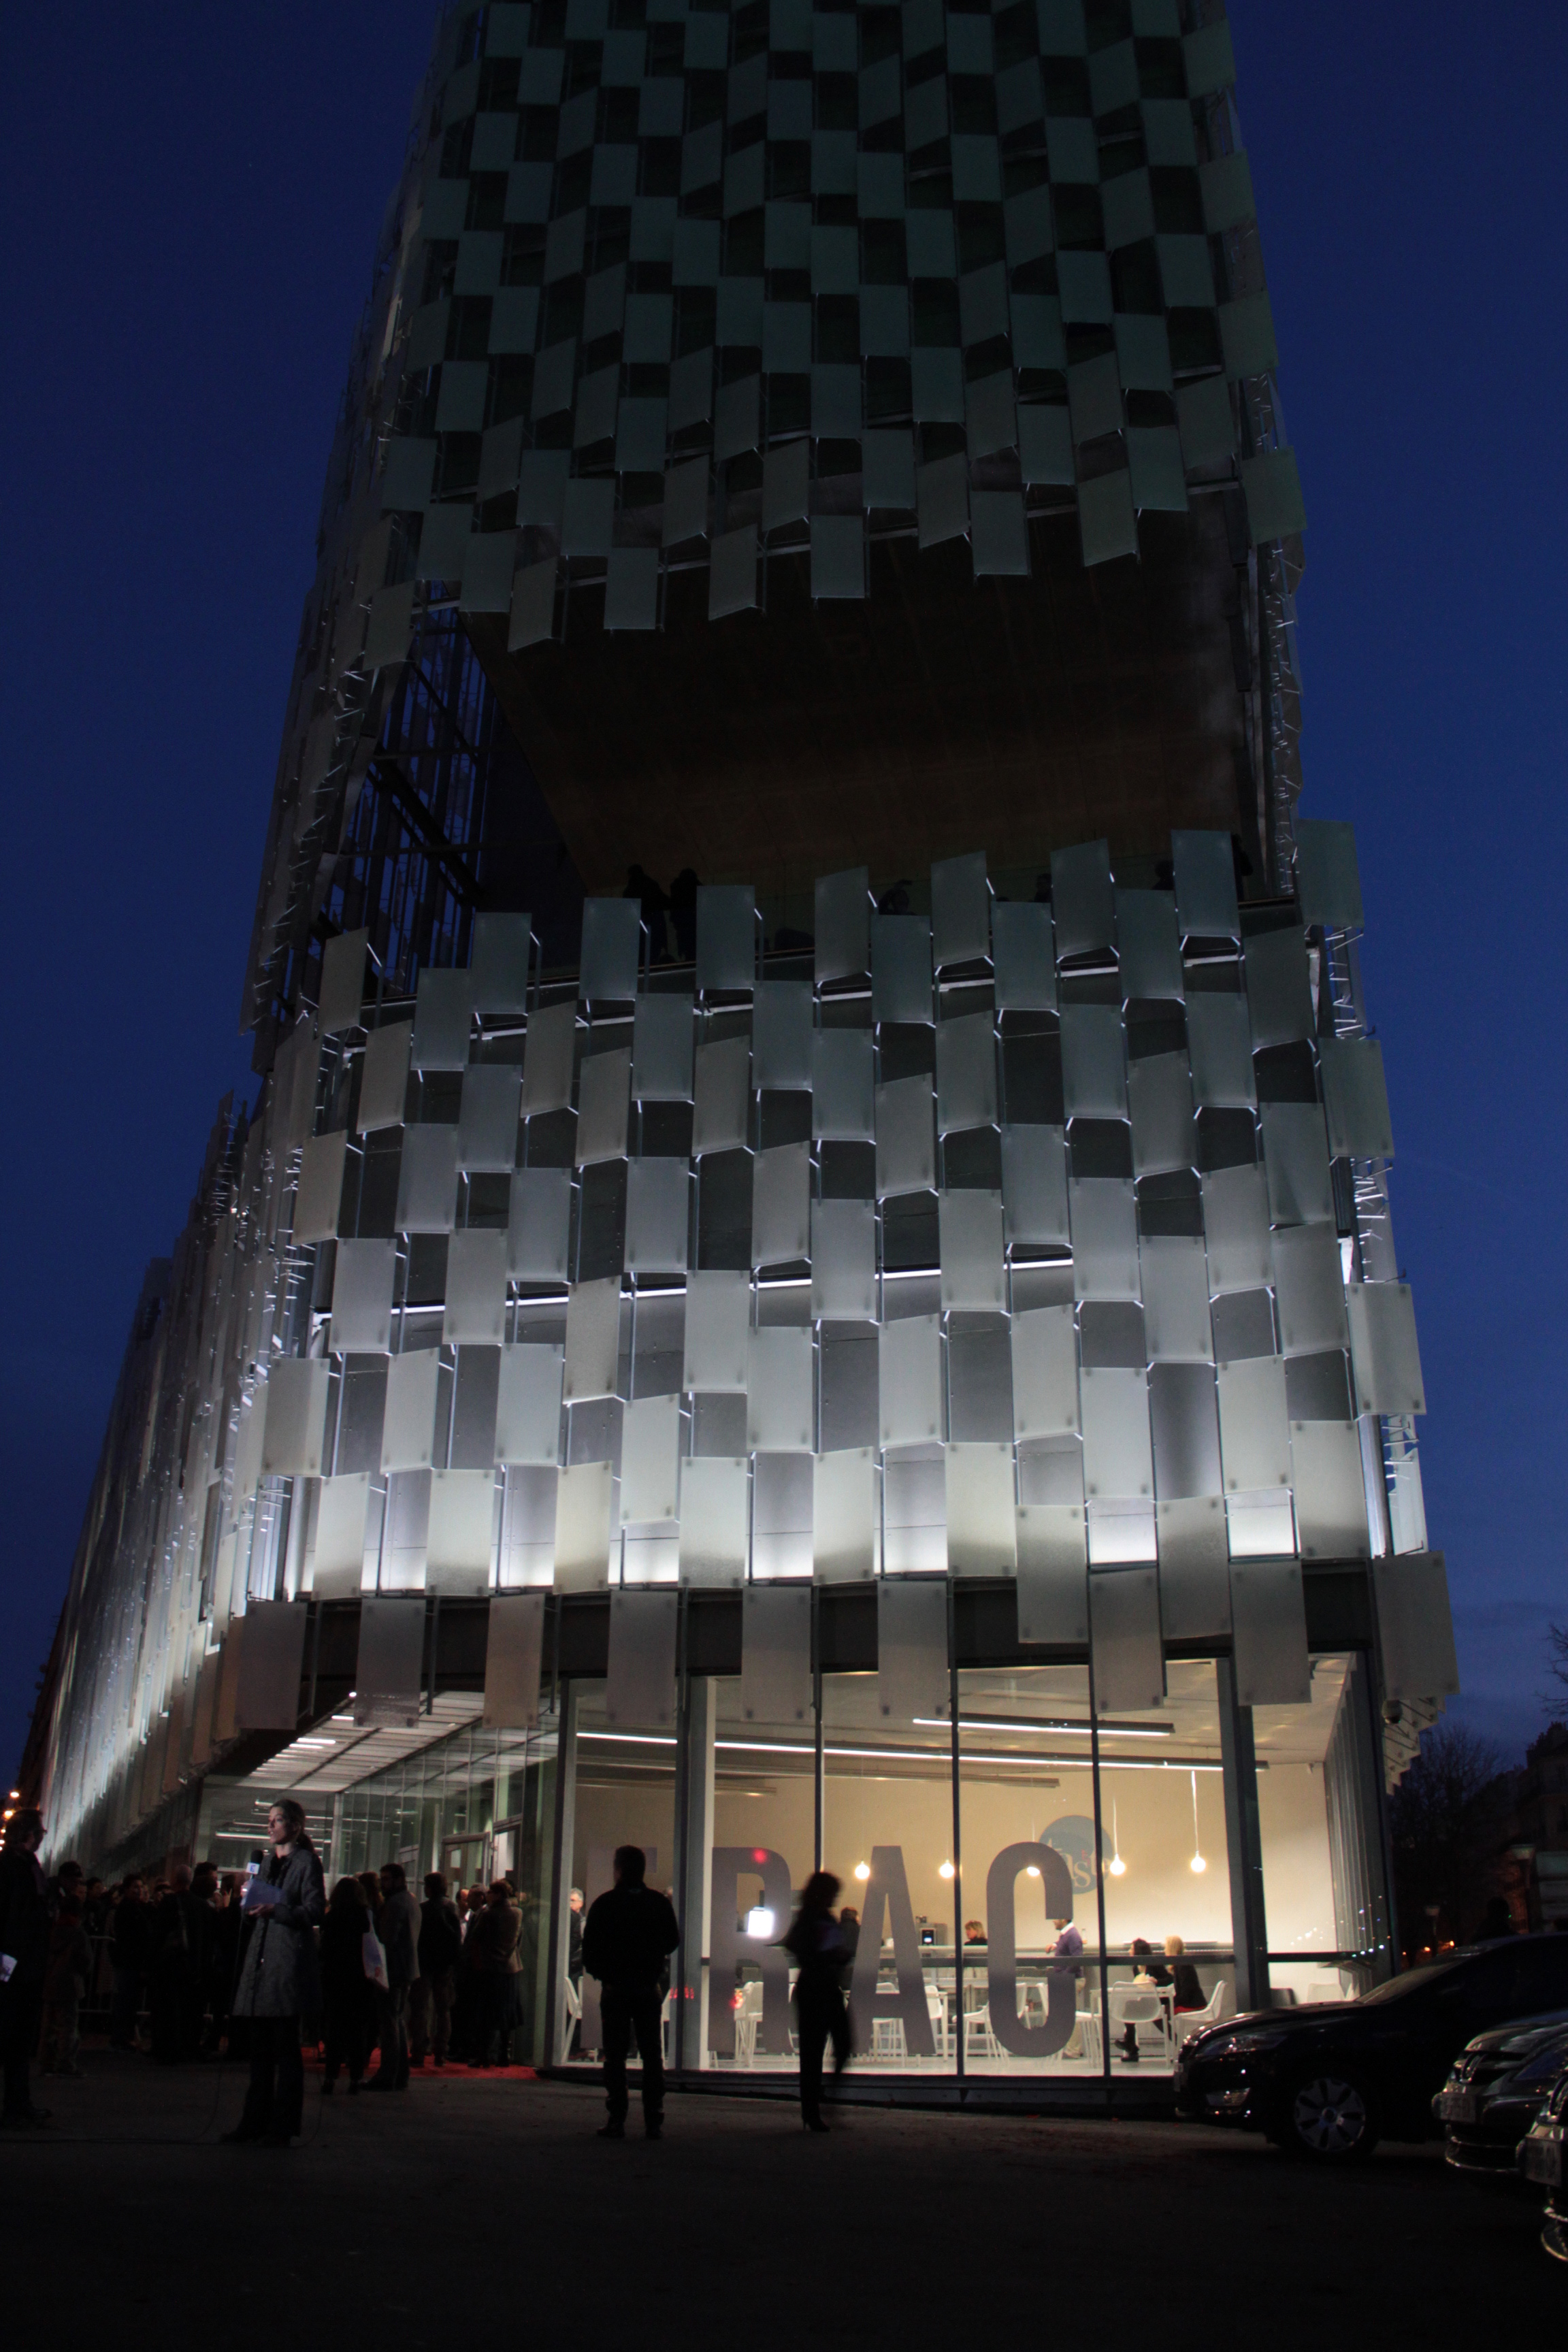 fronton-frac-paca-architecte-kengo-kuma-joliette-marseille